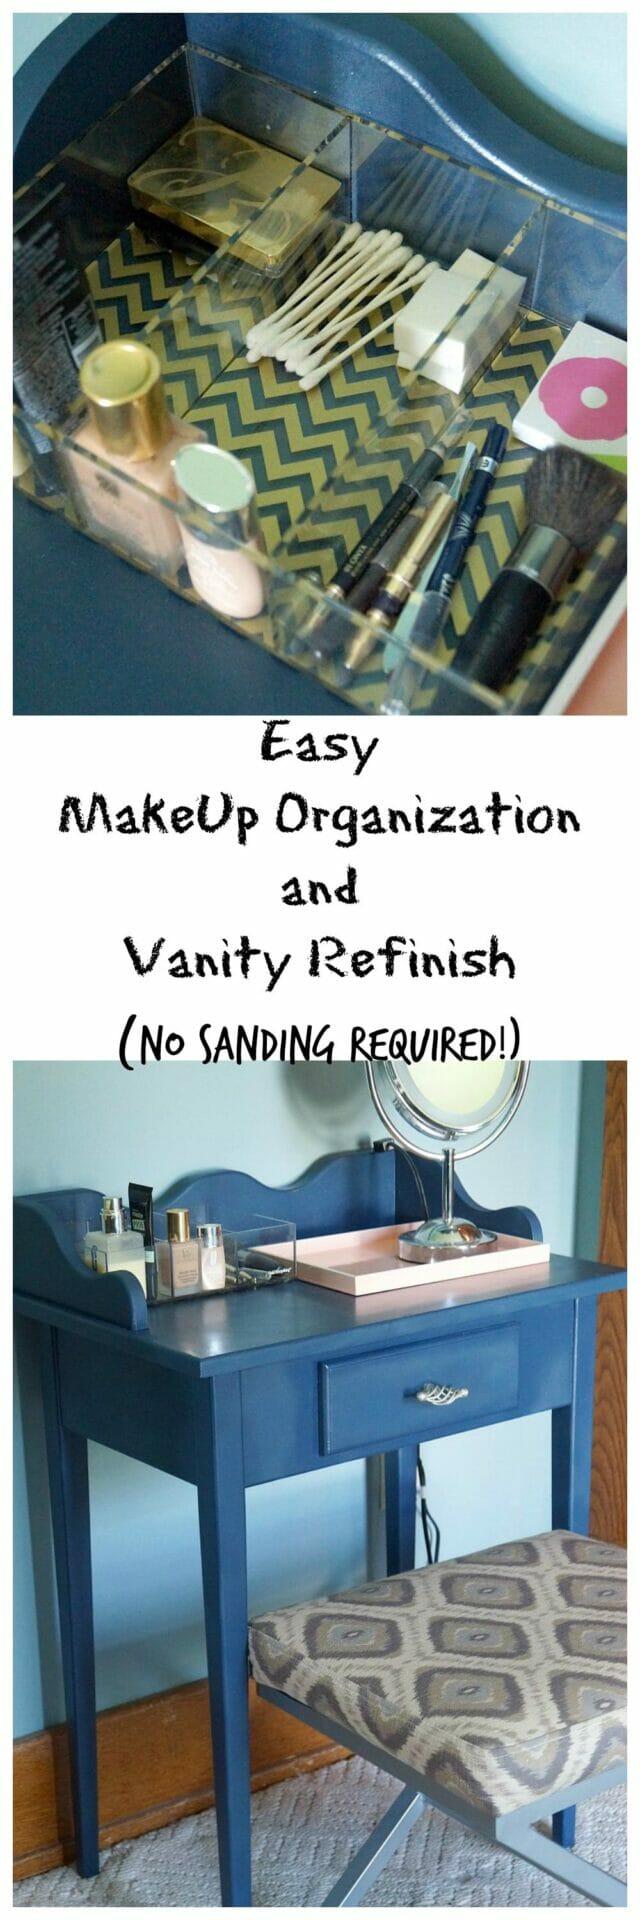 Make Up Organization and Vanity Refinish-No Sanding Required!